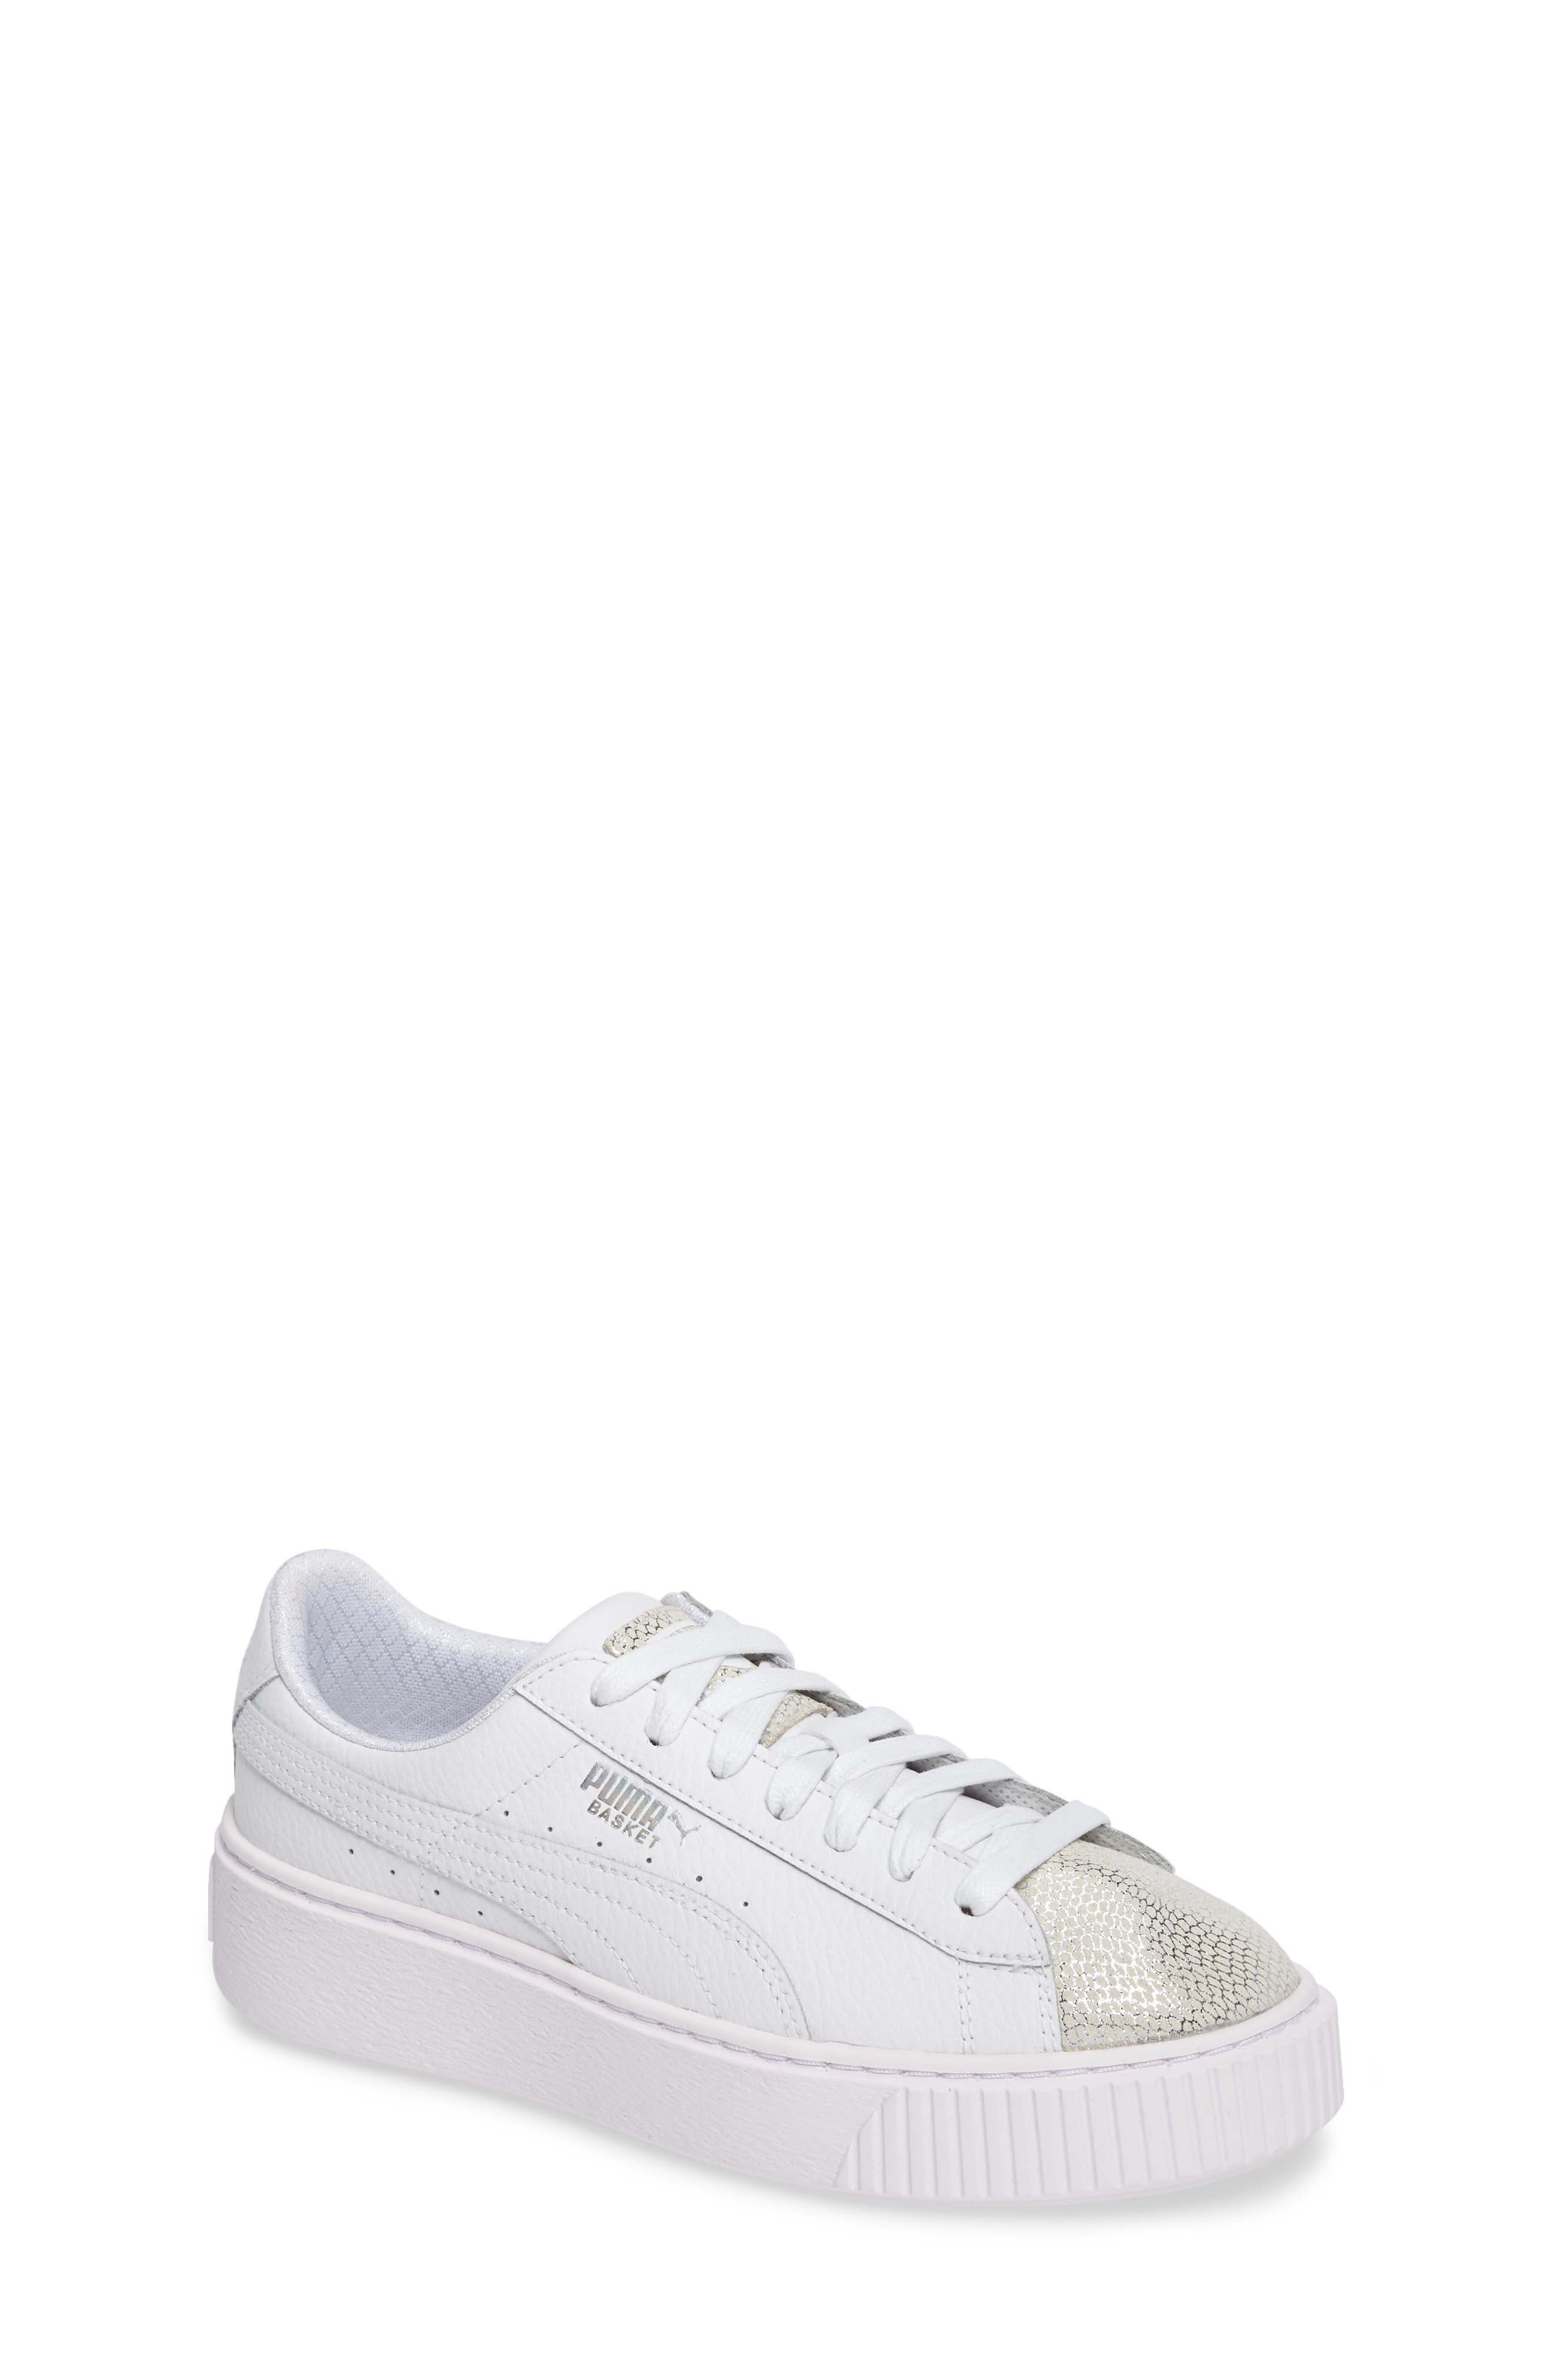 PUMA Basket Glitz Platform Sneaker